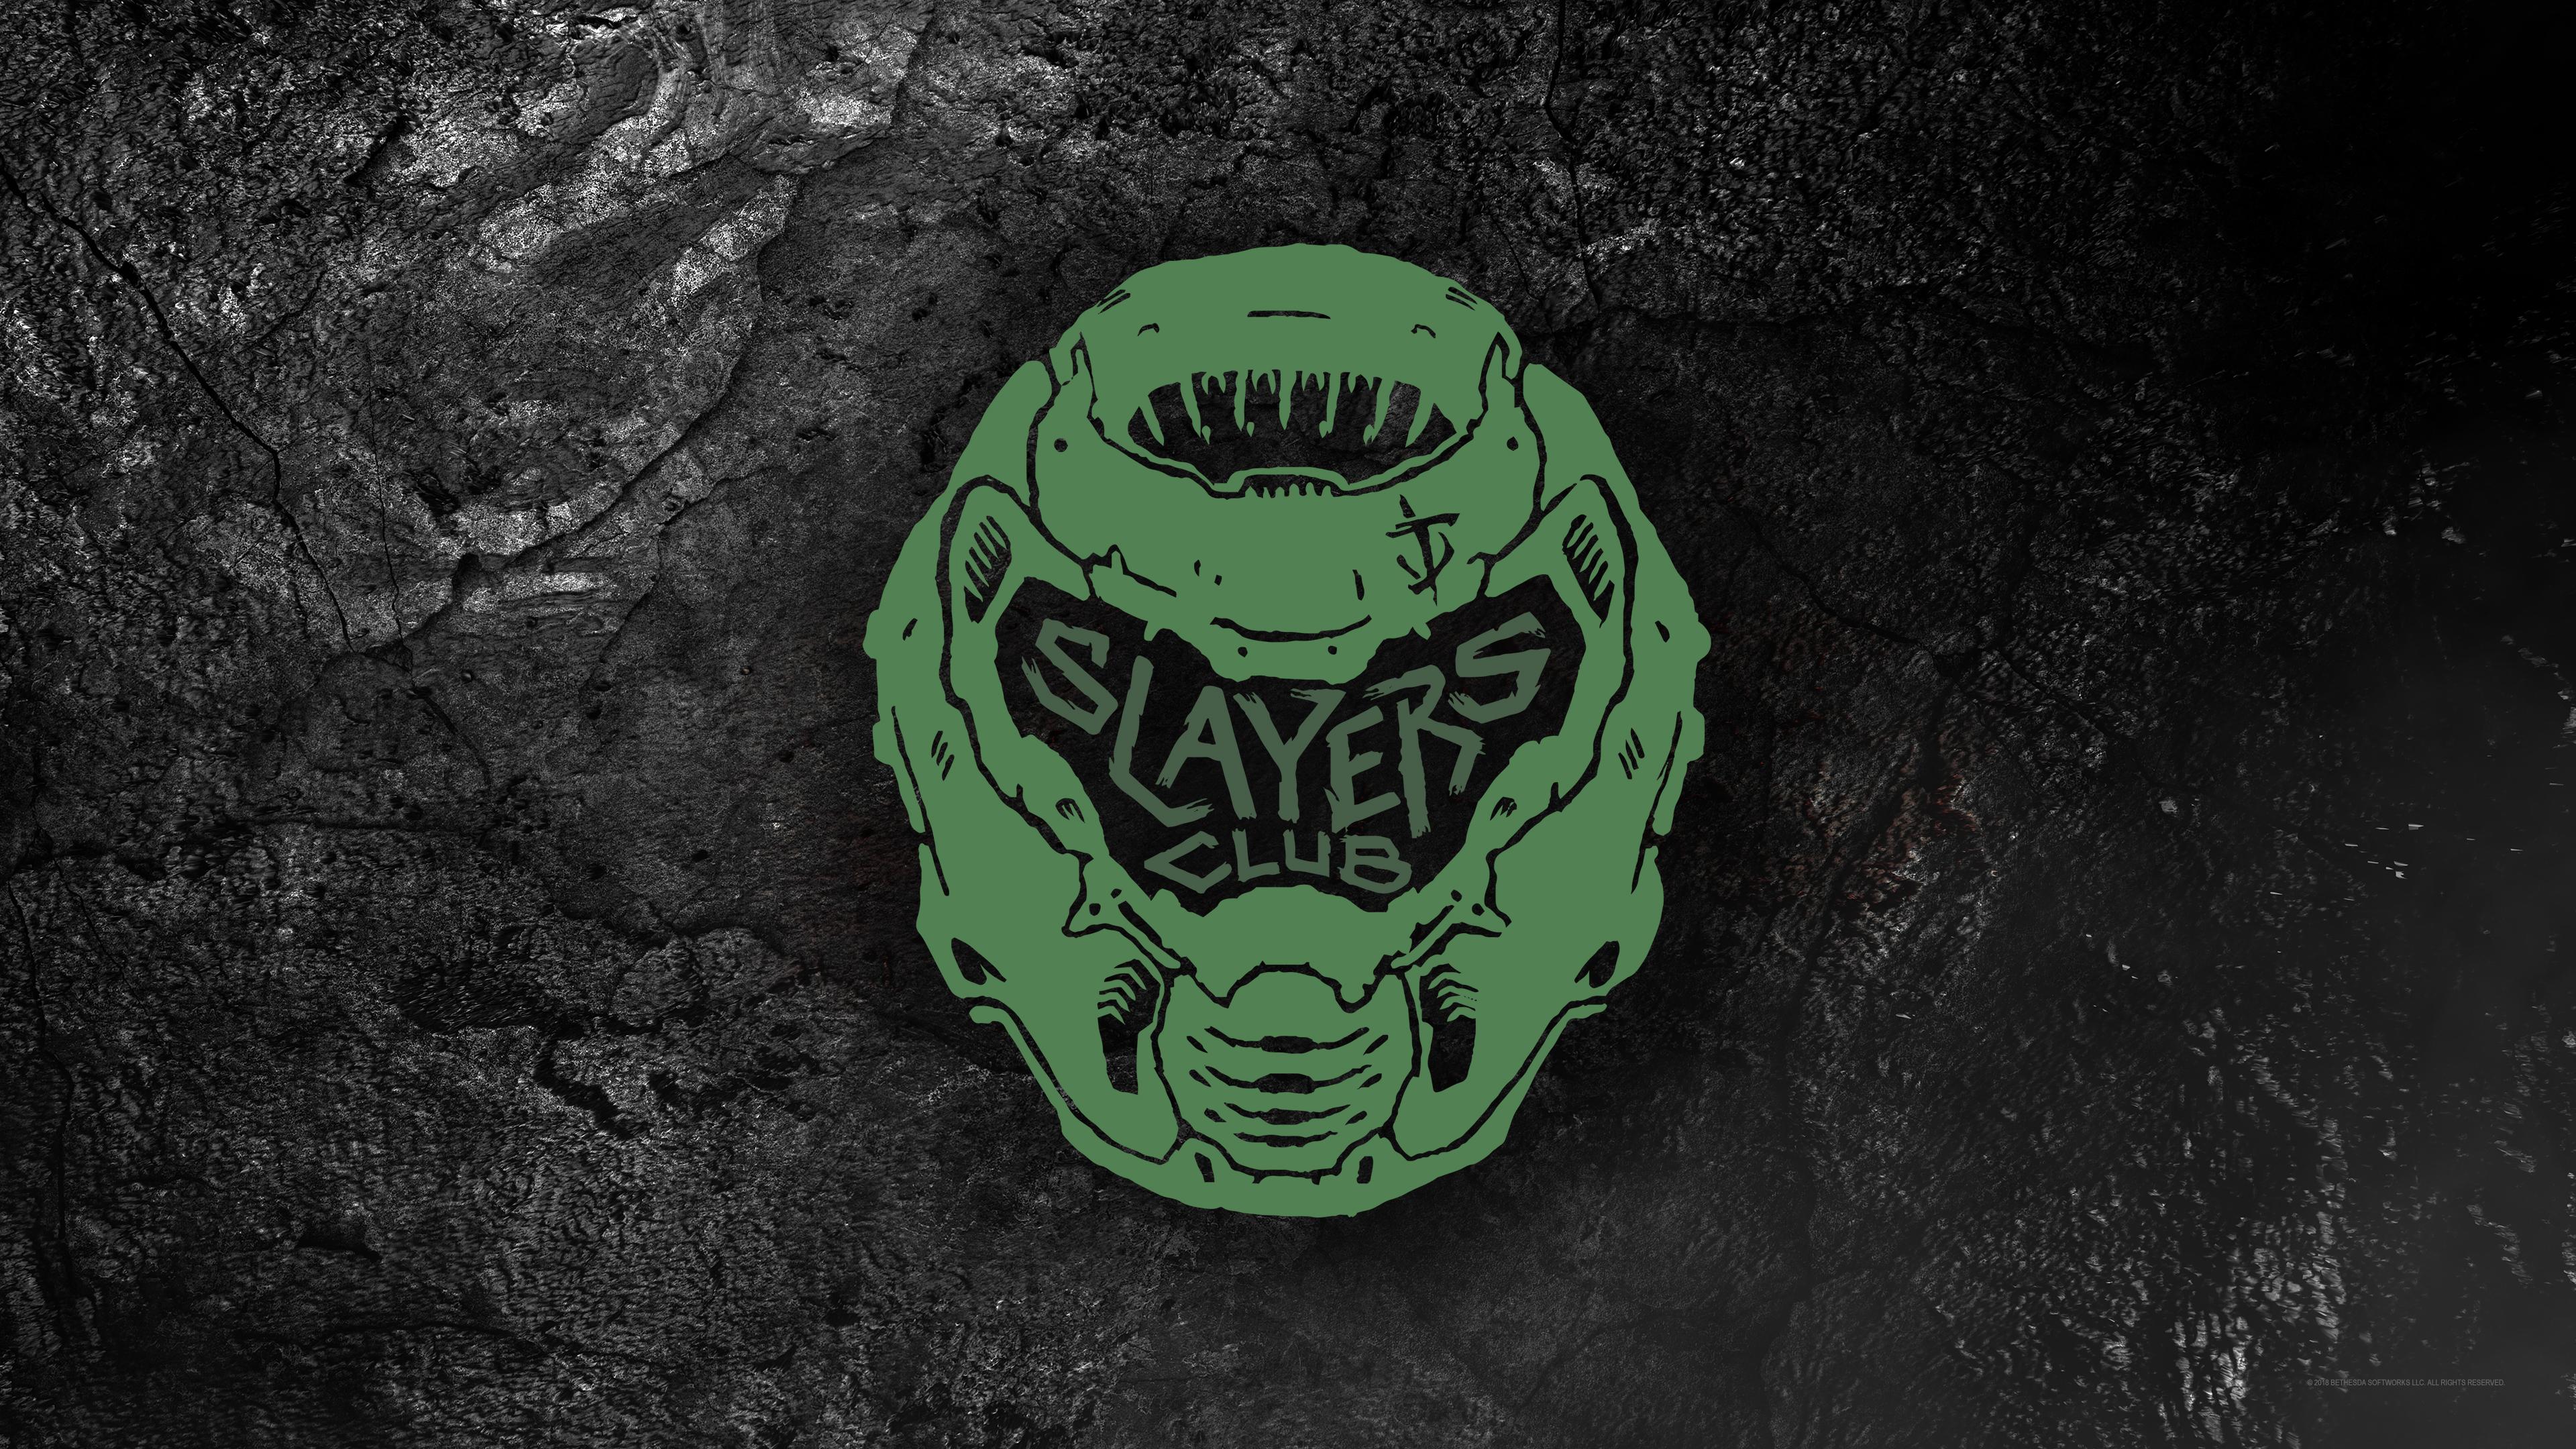 doom slayers club 1581273739 - Doom Slayers Club - Doom Slayers Club wallpapers, Doom Slayers Club 4k wallpapers